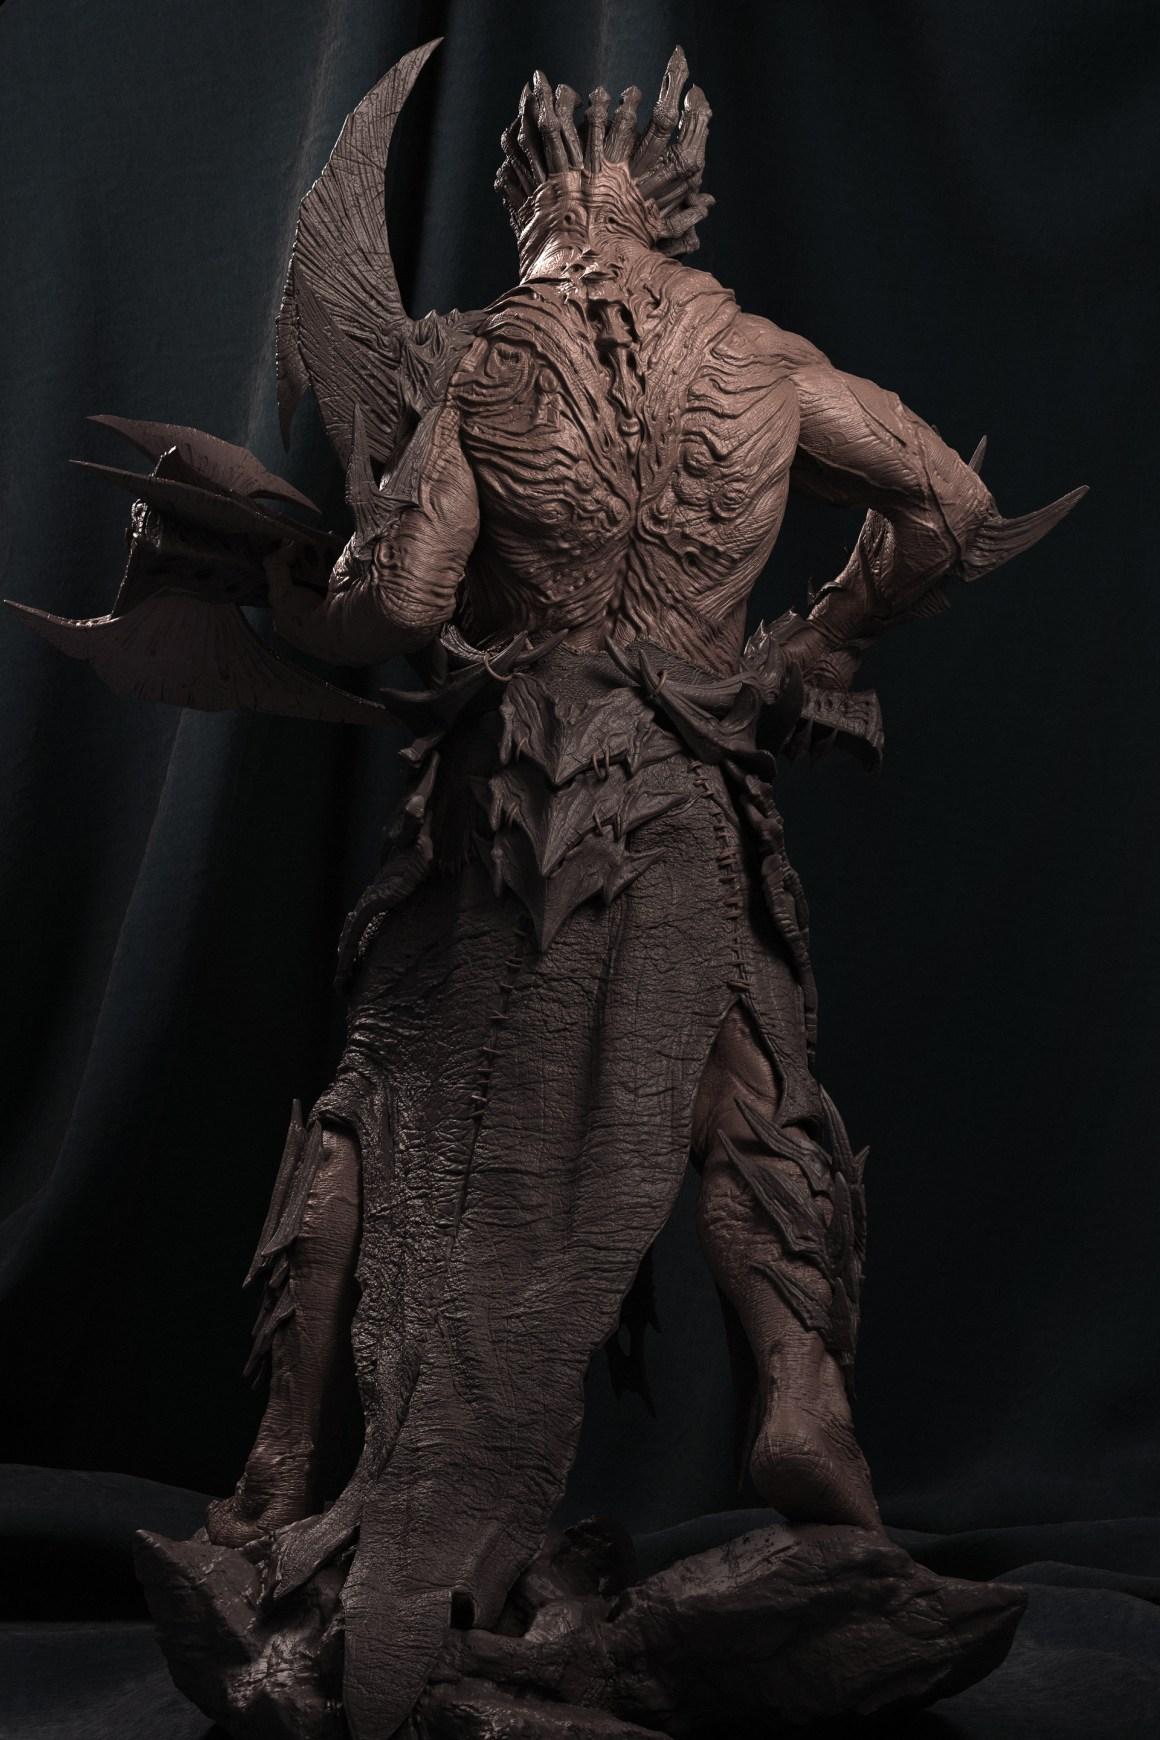 Faceless Demon by Berto Souza